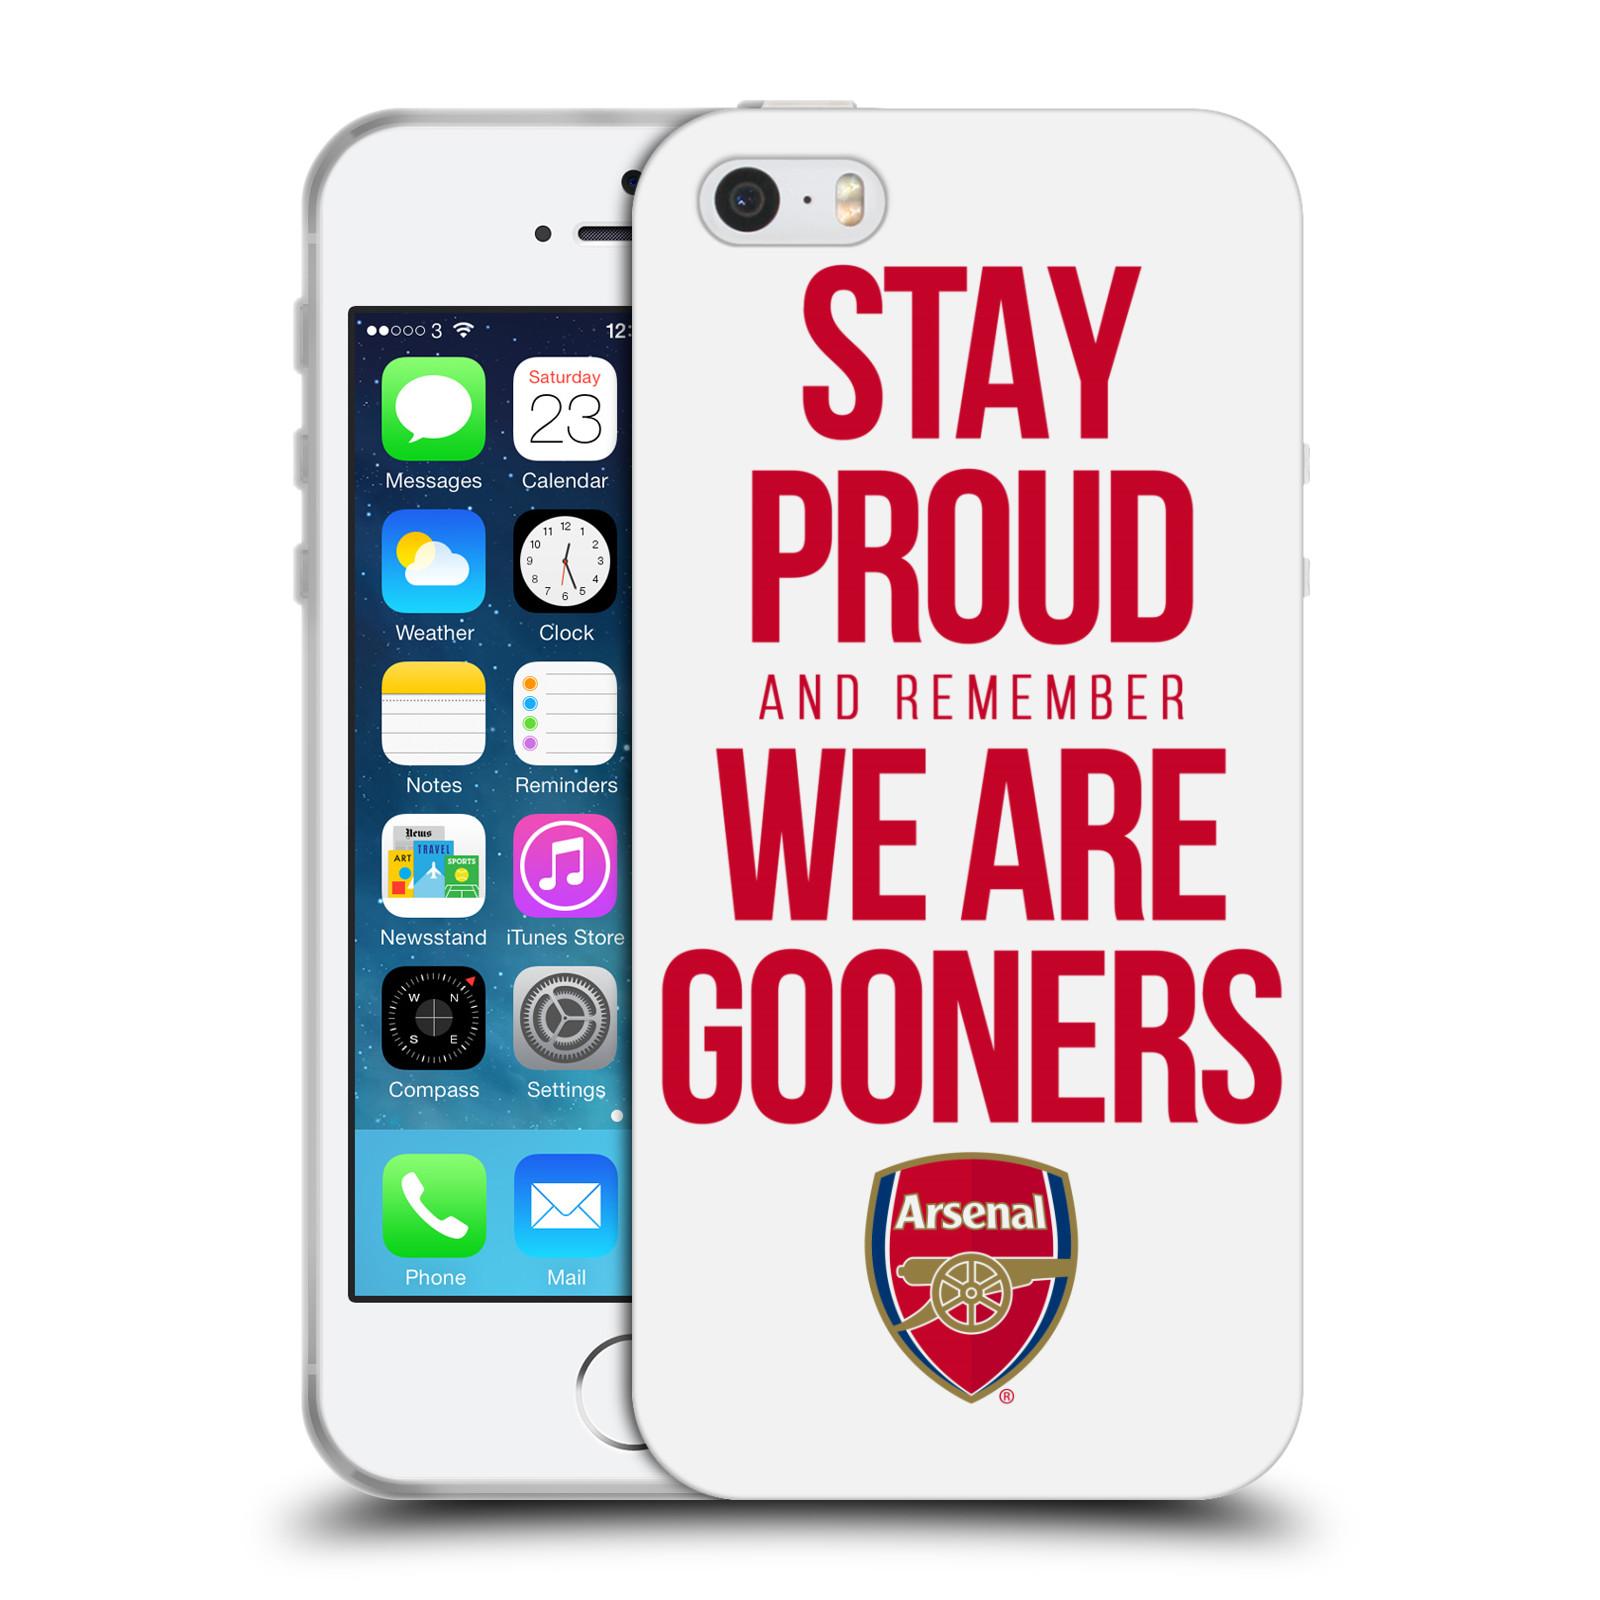 HEAD CASE silikonový obal na mobil Apple Iphone 5 5S Fotbalový klub Arsenal  hrdost bílé empty 7a82eb69598